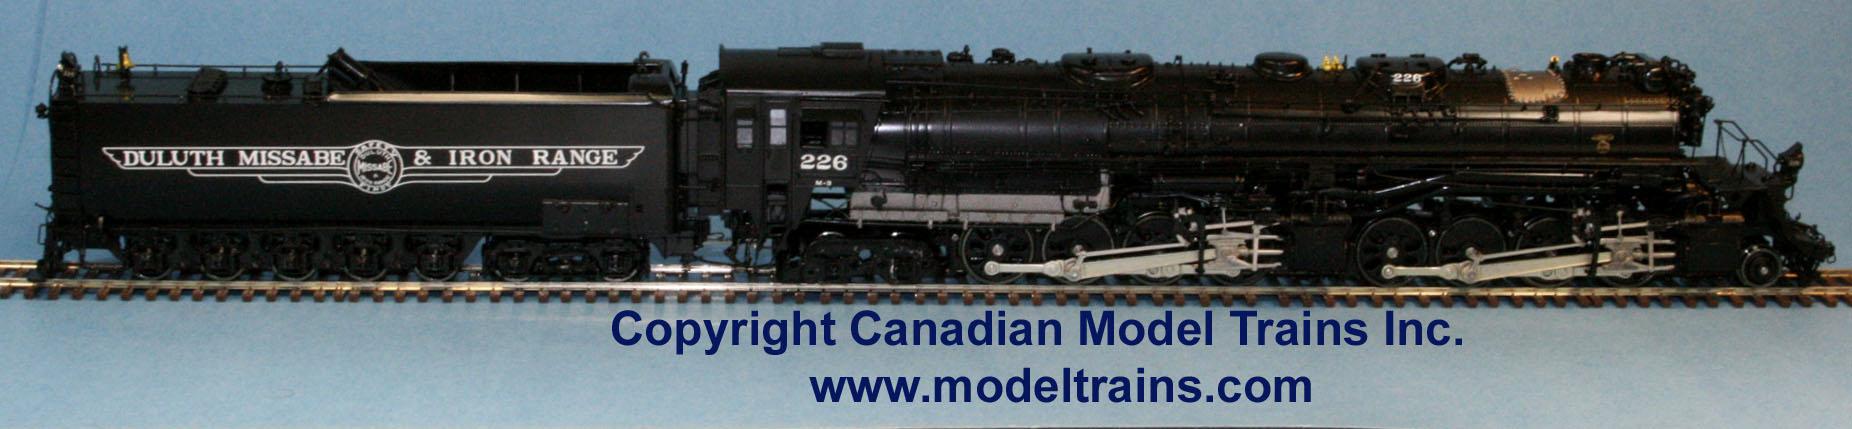 PSC 17214.1 - M-3, DM&IR, 2-8-8-4, Yellowstone, black boiler, No.226.2